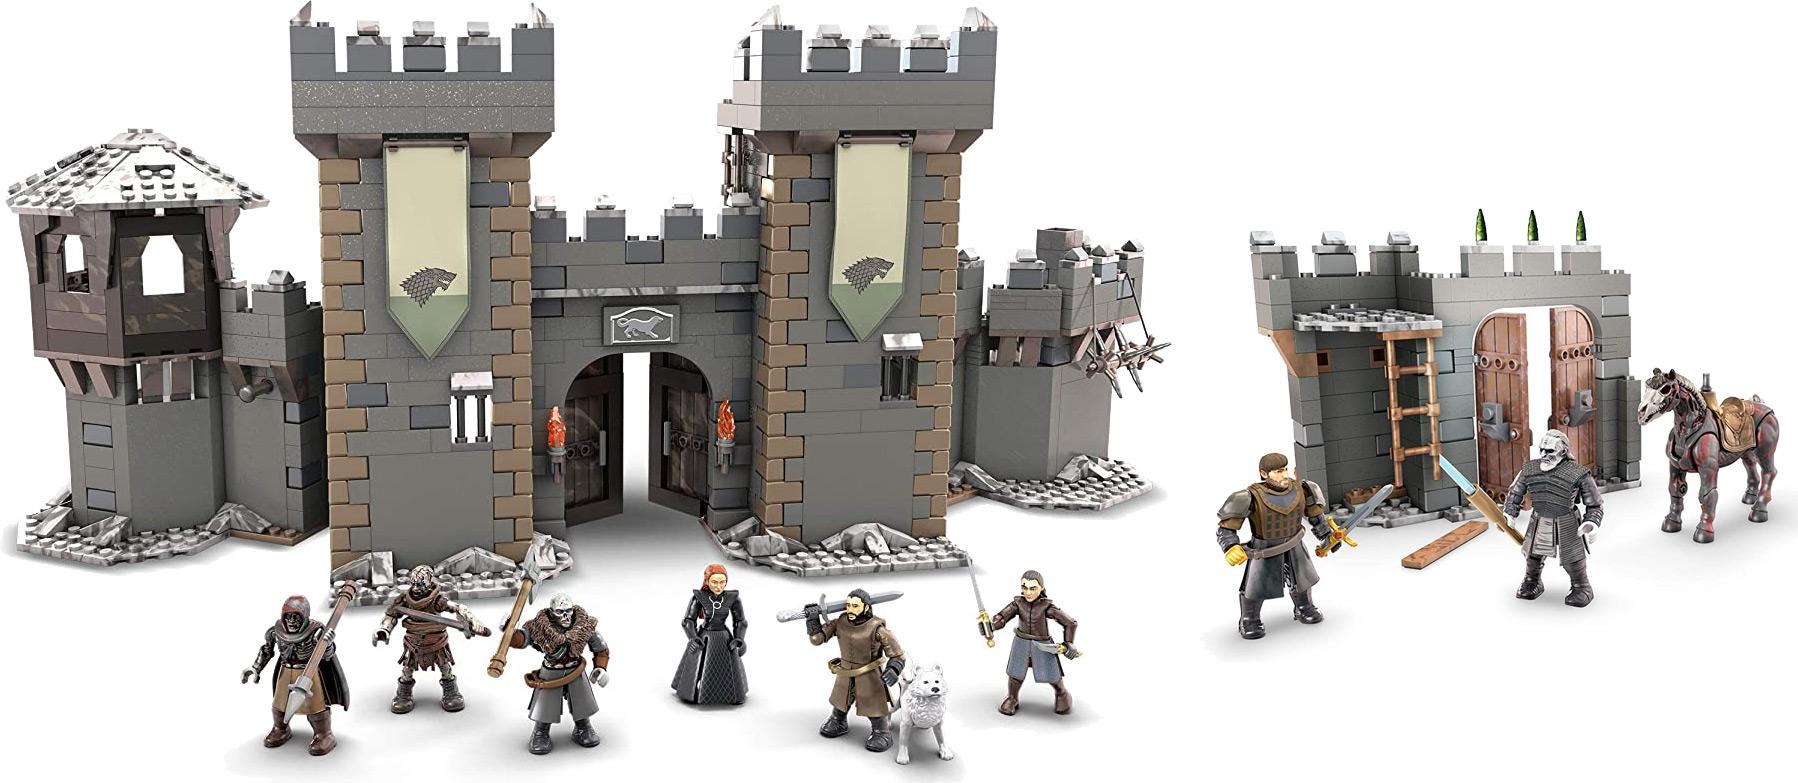 Jeu de construction bataille de Winterfell